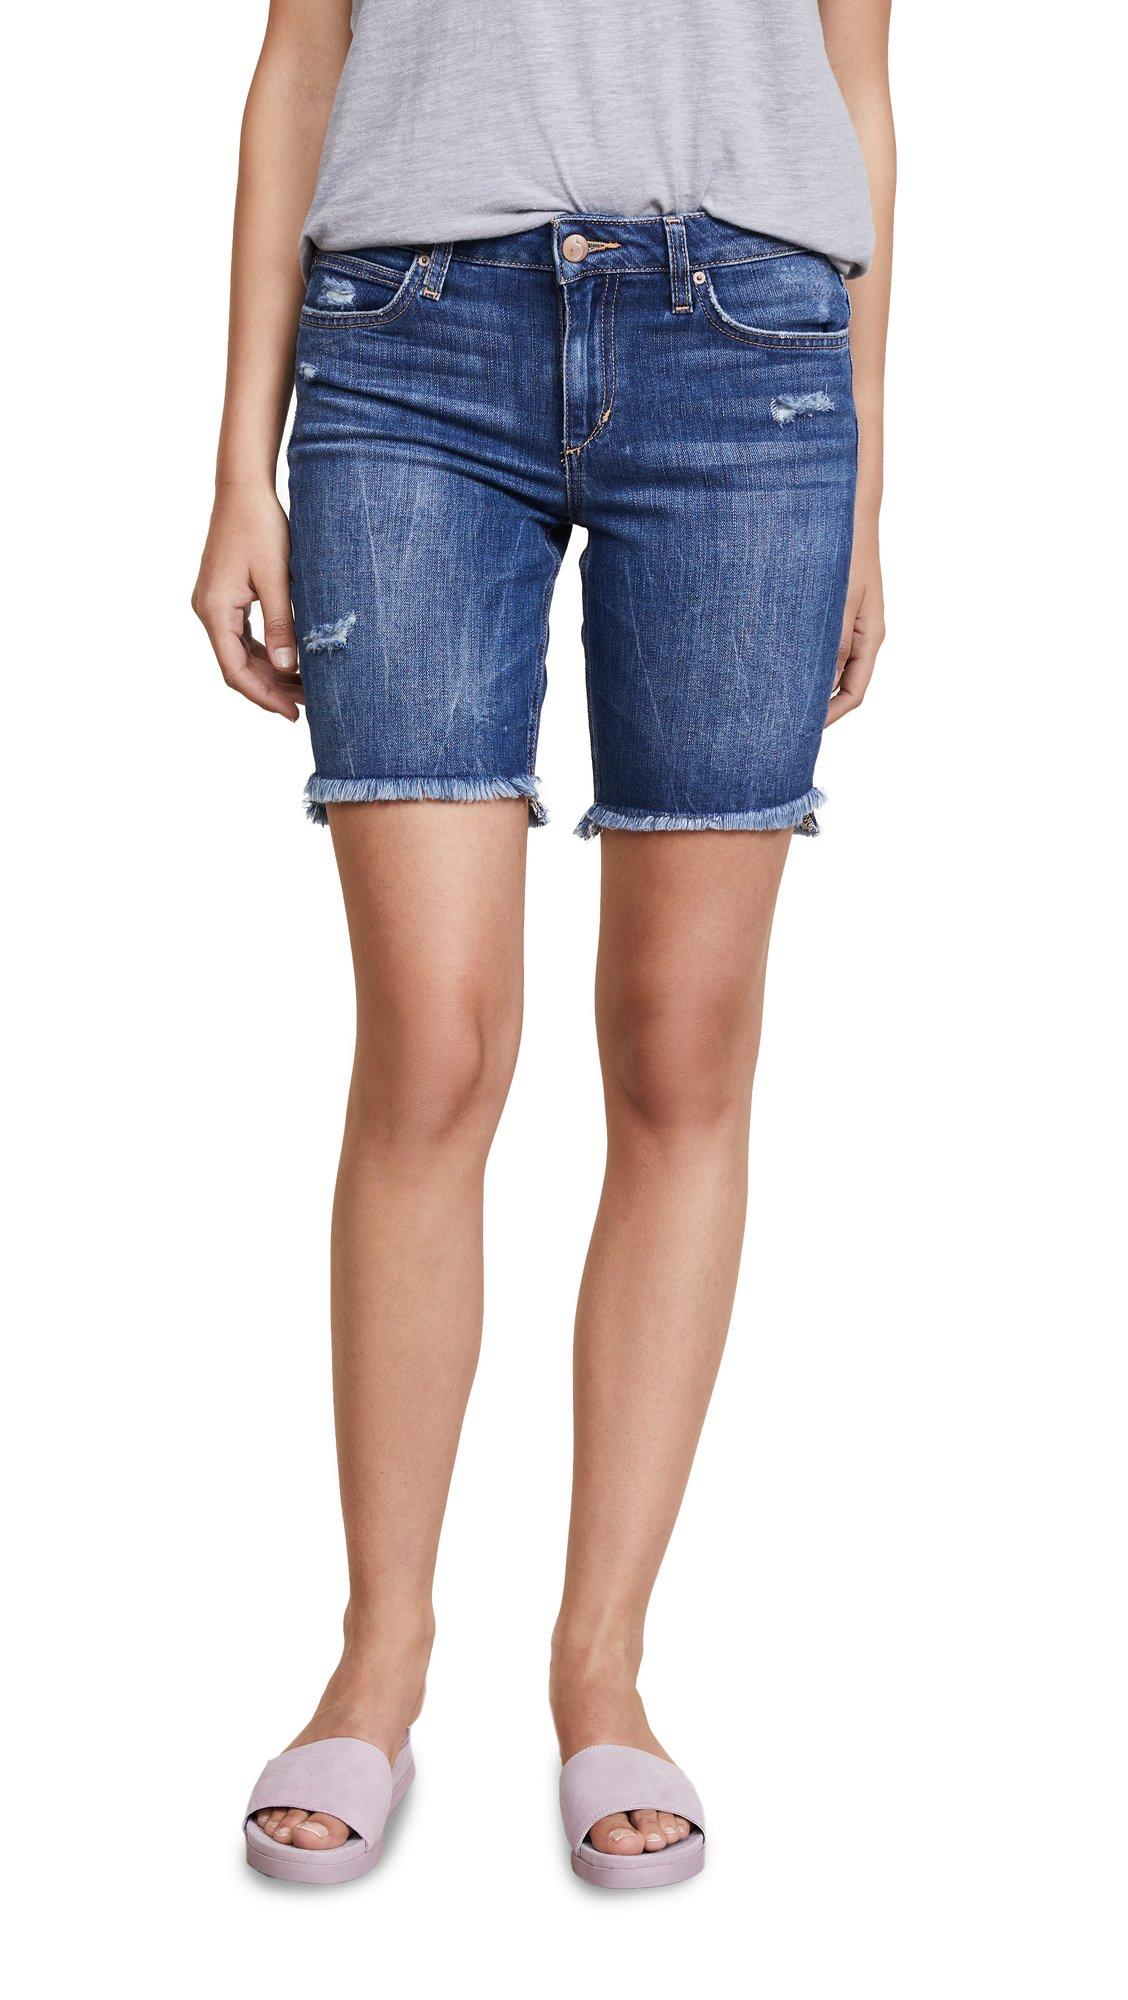 Joe's Jeans Women's Finn Midrise Cut Off Burmuda Jean Short, Karinne, 31